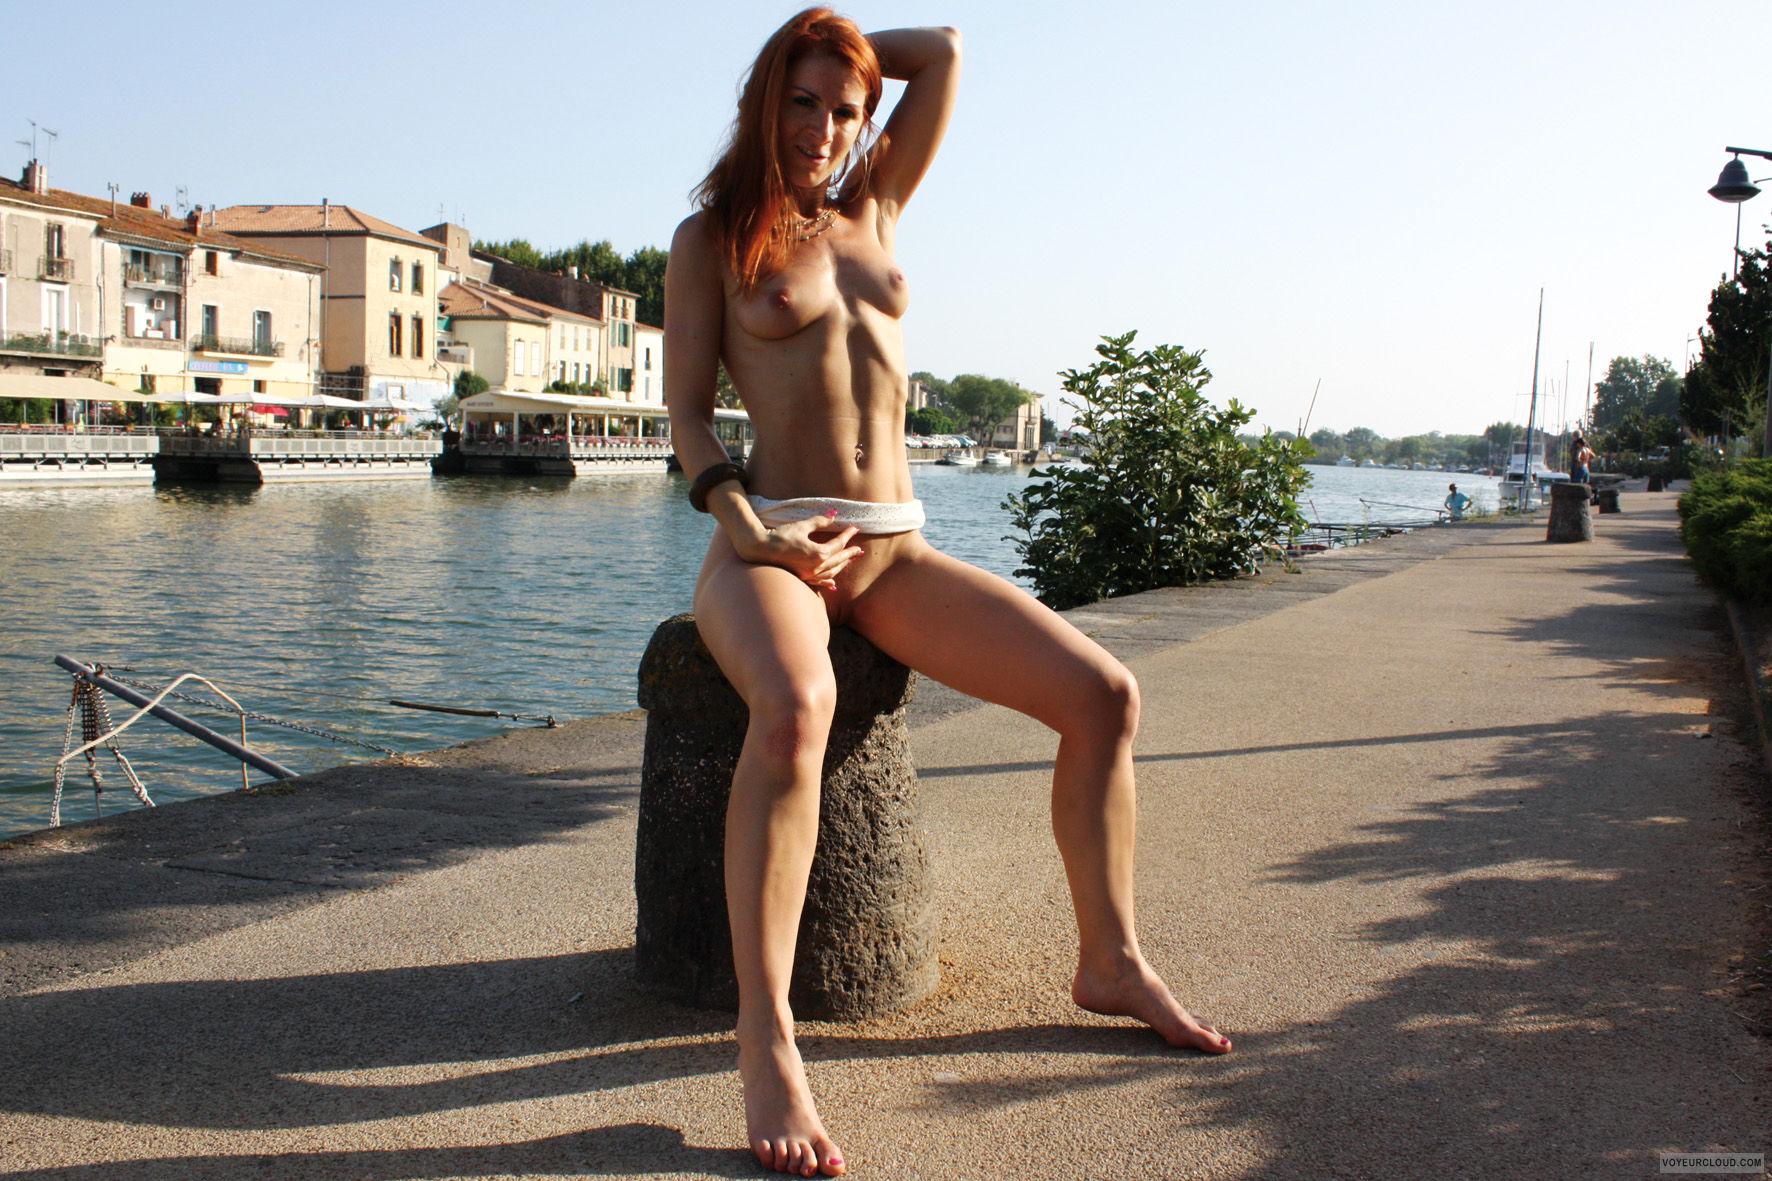 vienna-hungary-&-france-nude-public-03